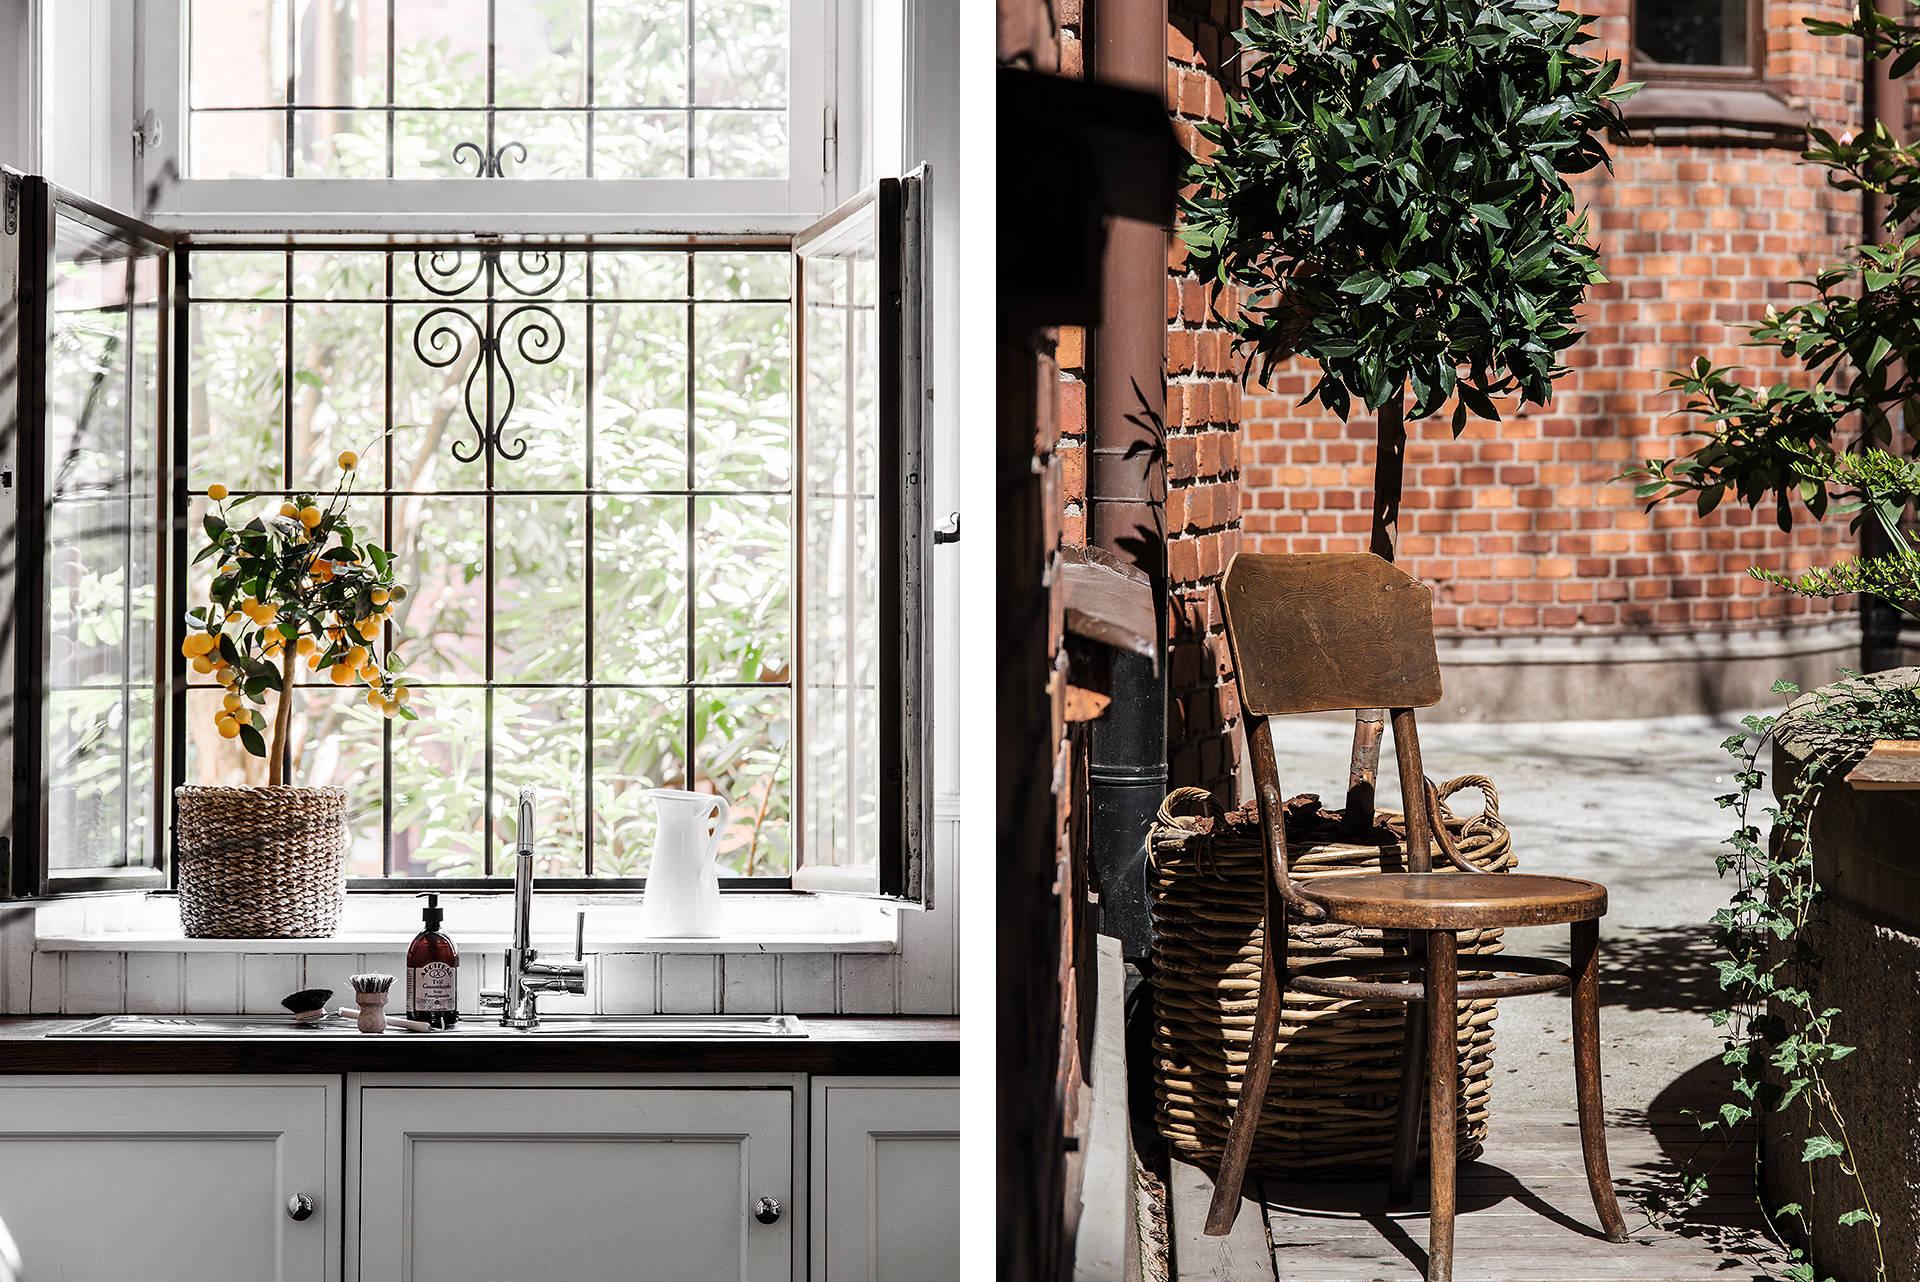 окно кухня столешница дворик под окном